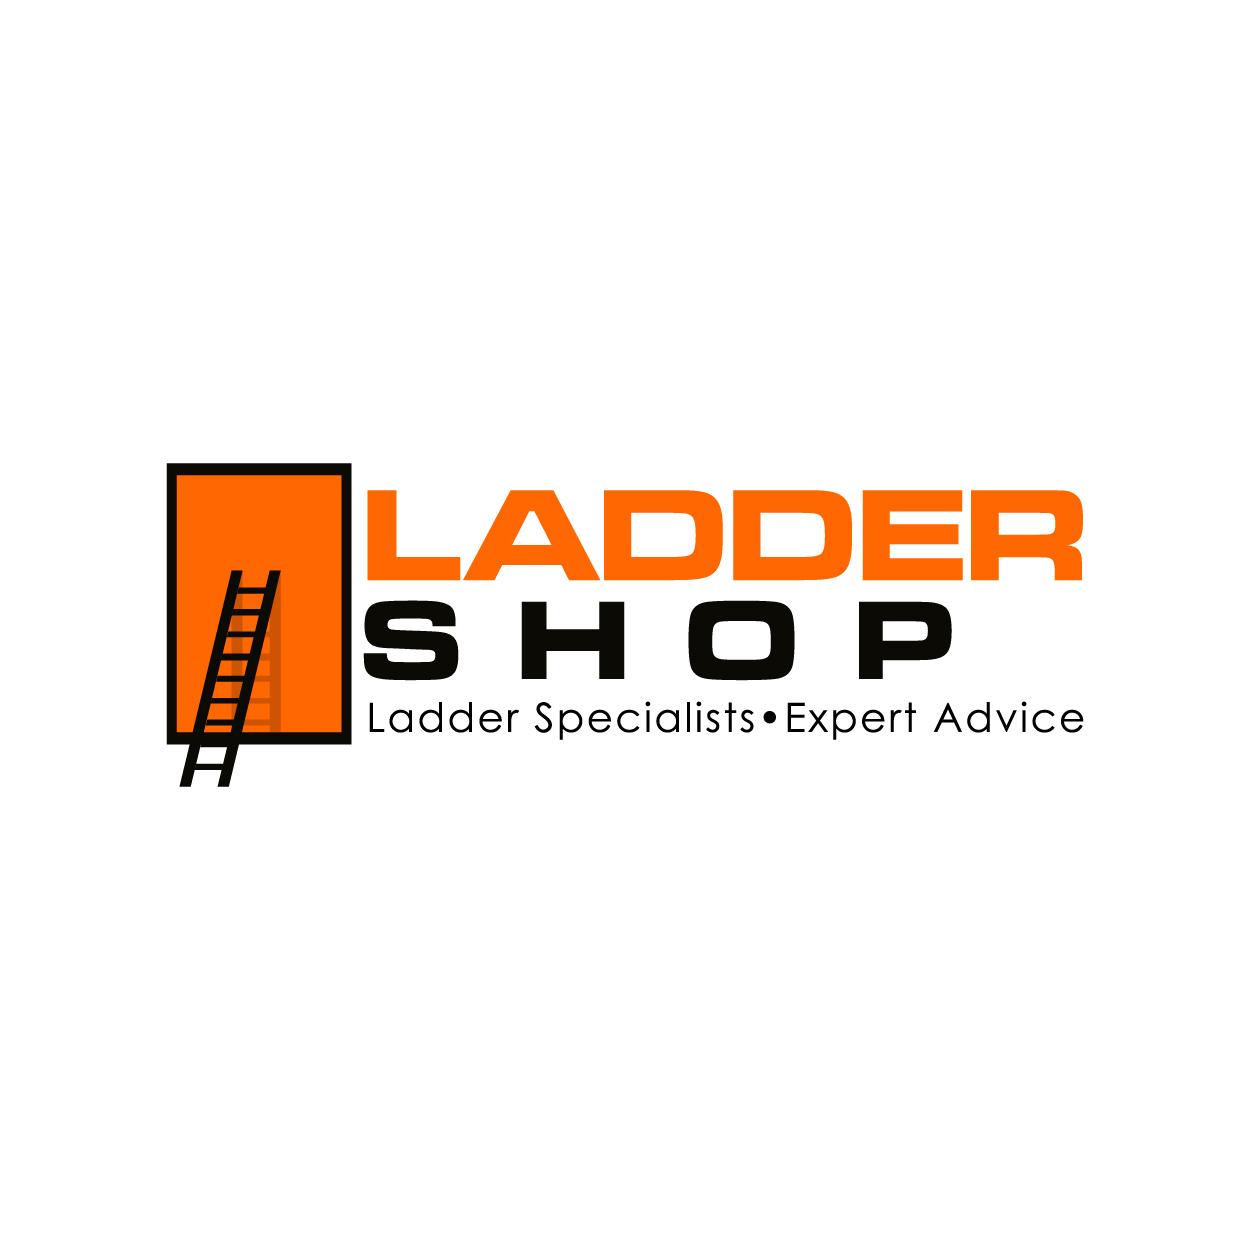 The Ladder Shop